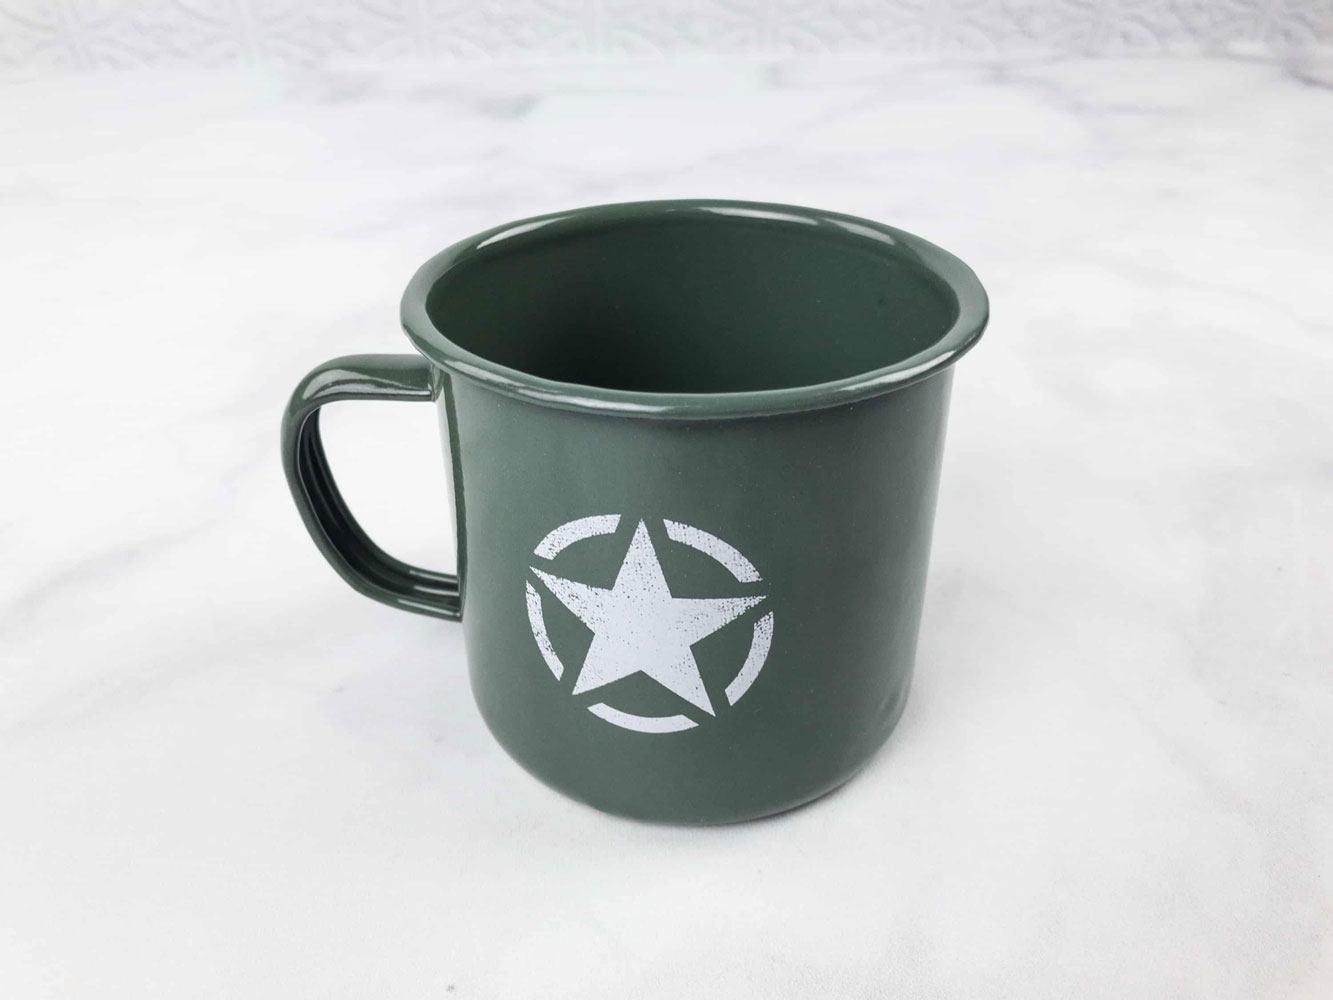 Call of Duty Metal Mug Lootcrate Exclusive